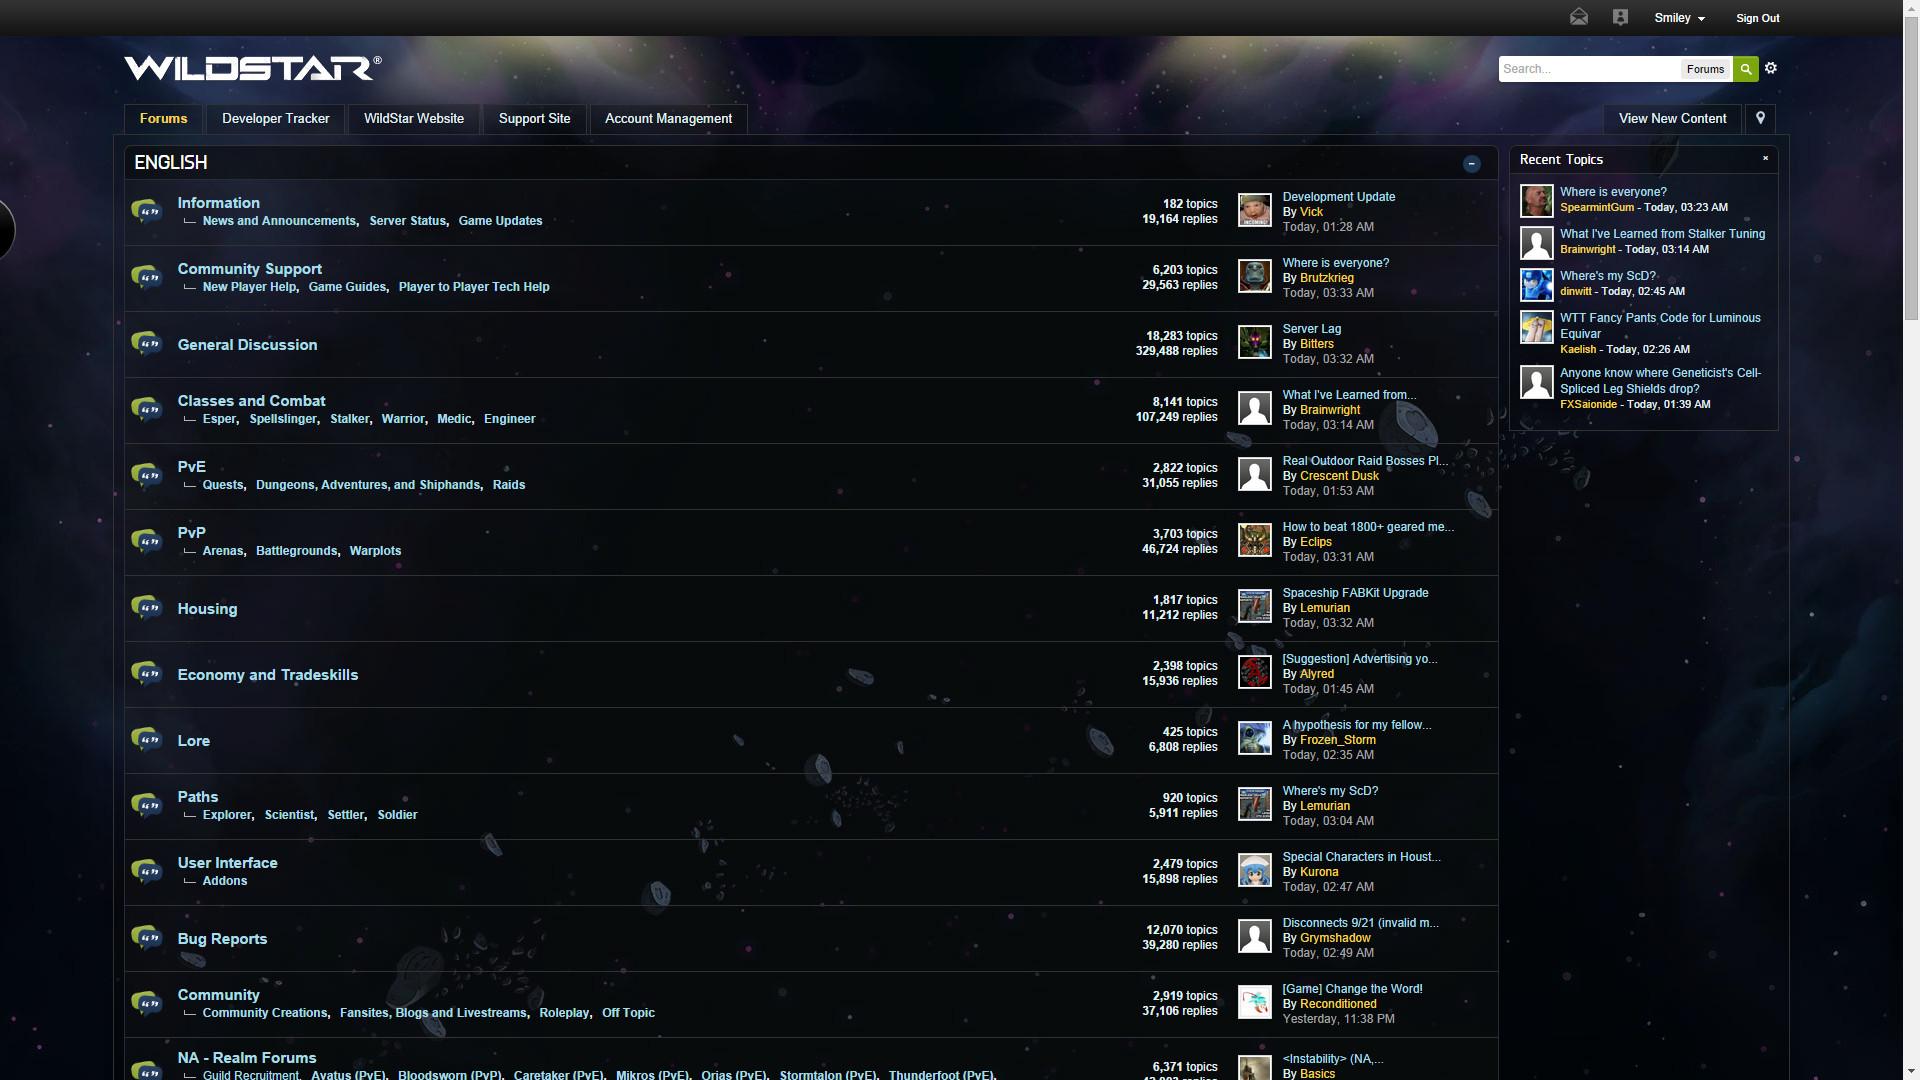 wildstar-forum-space.jpg